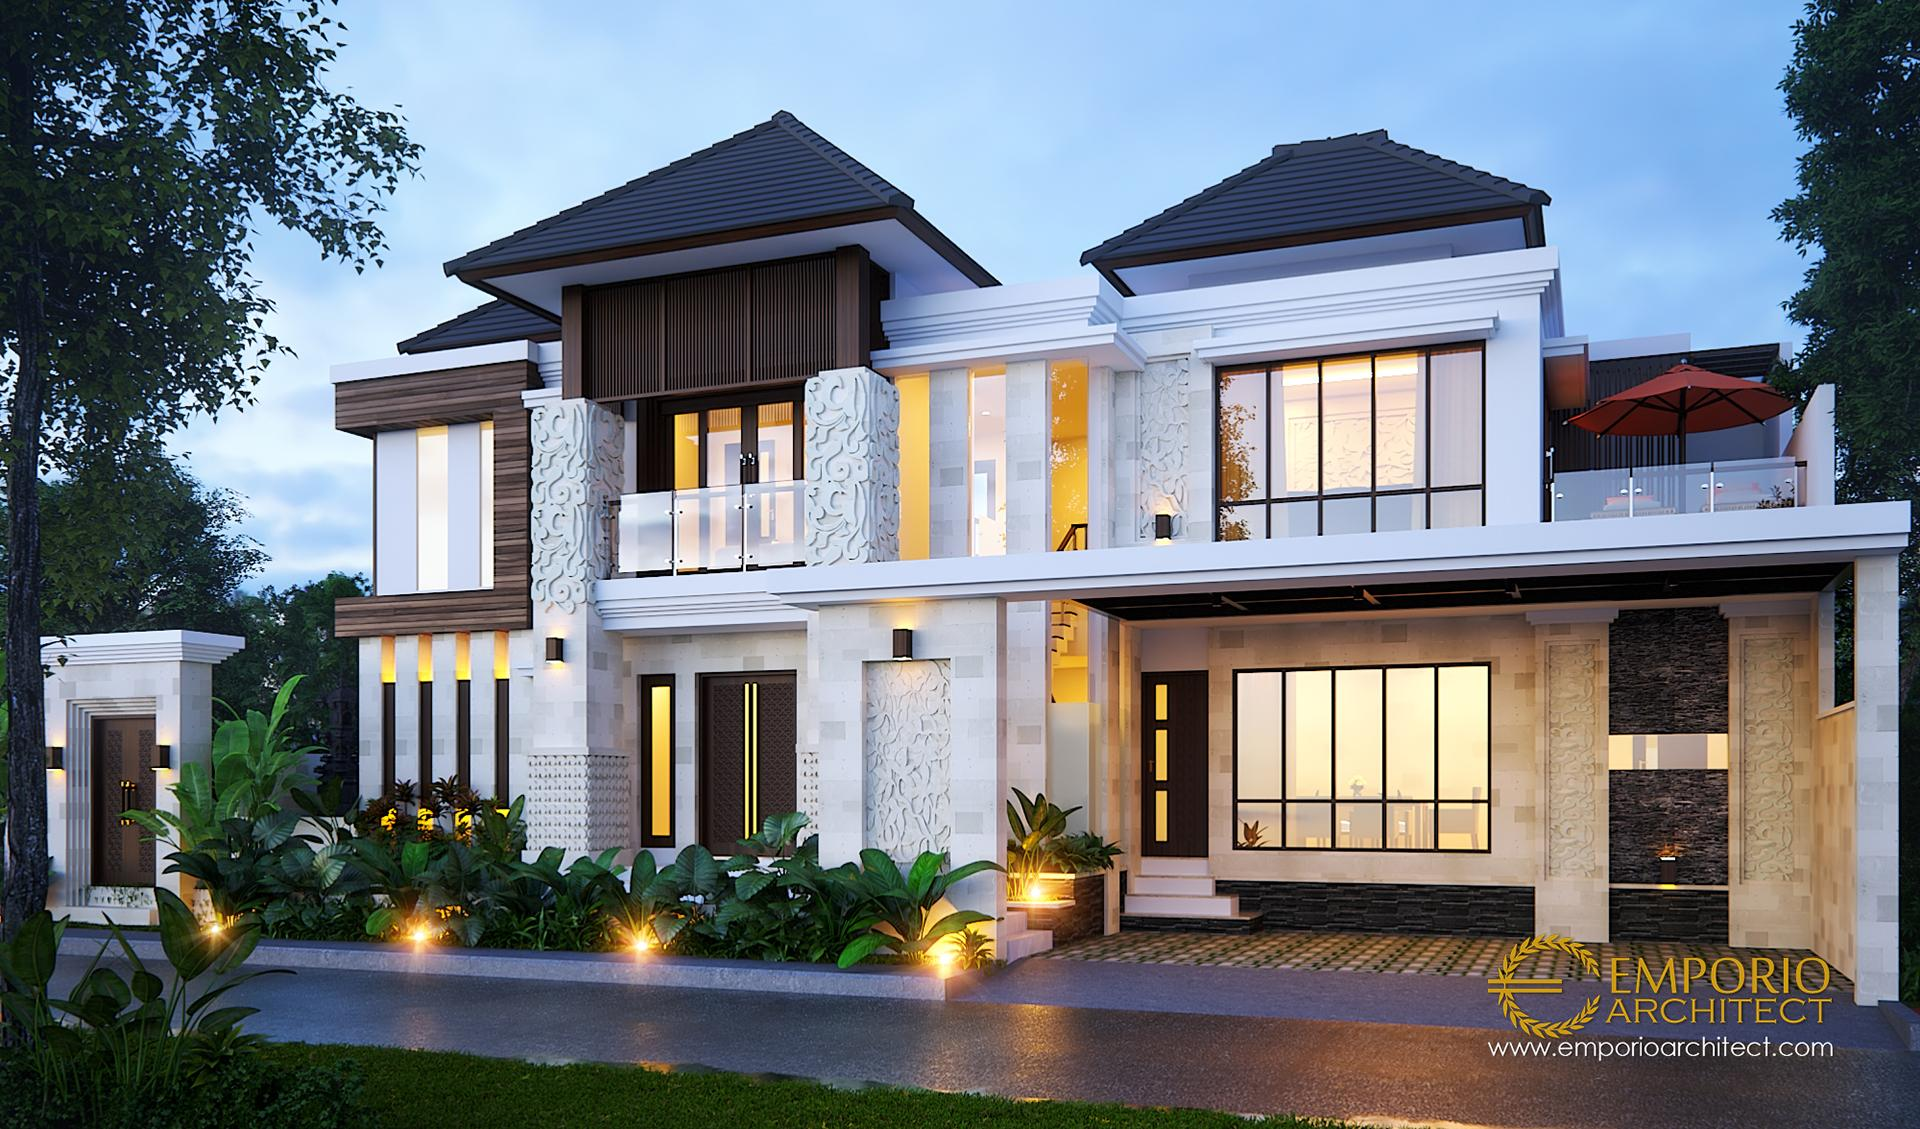 Desain Rumah Hook Villa Bali 2 Lantai Bapak Agus Eka di  Gianyar, Bali